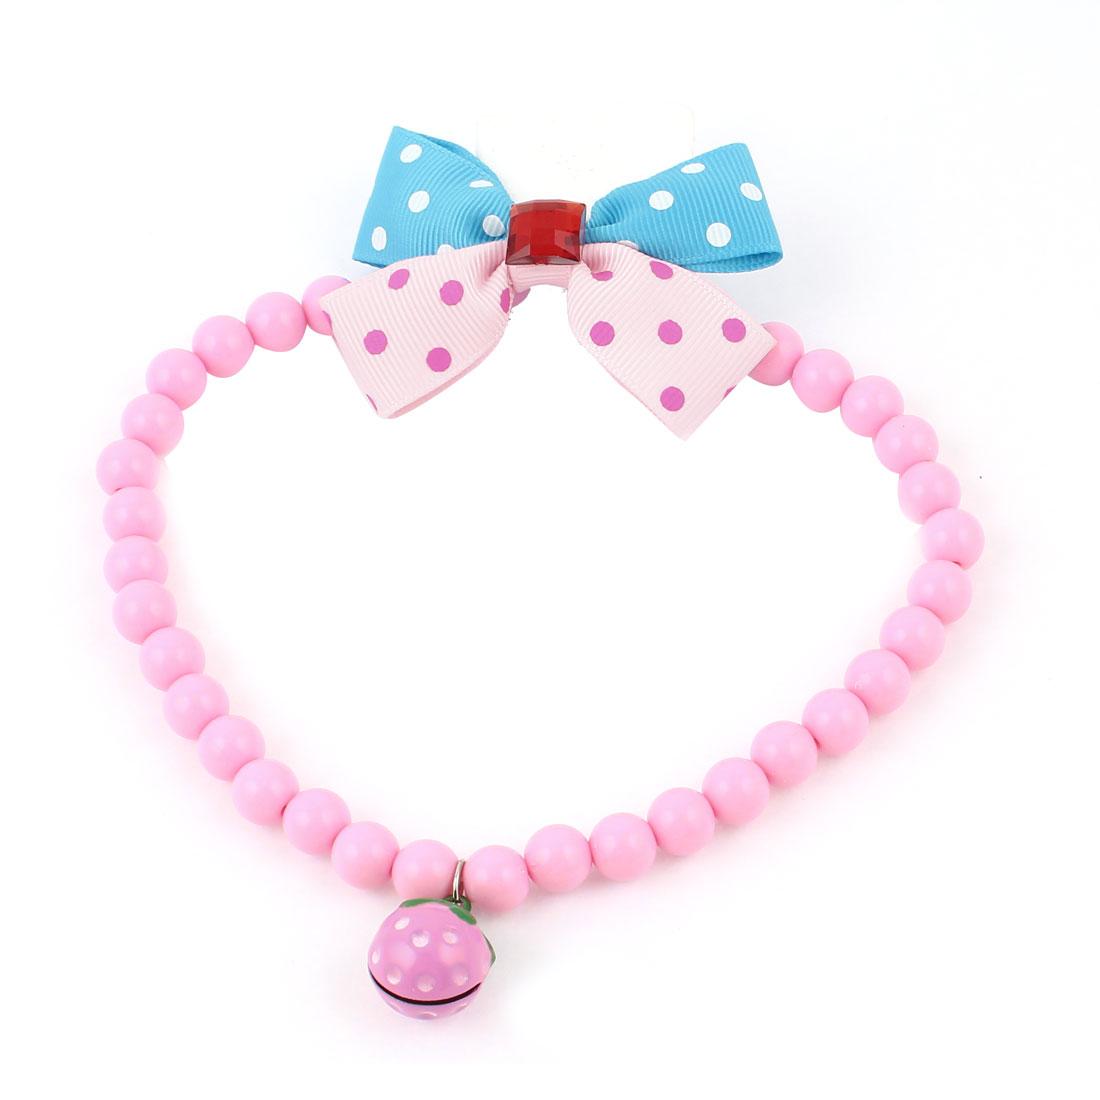 Metal Bell Pendant Bowtie Accent Pet Dog Plastic Beads Collar Necklace Pink Blue L